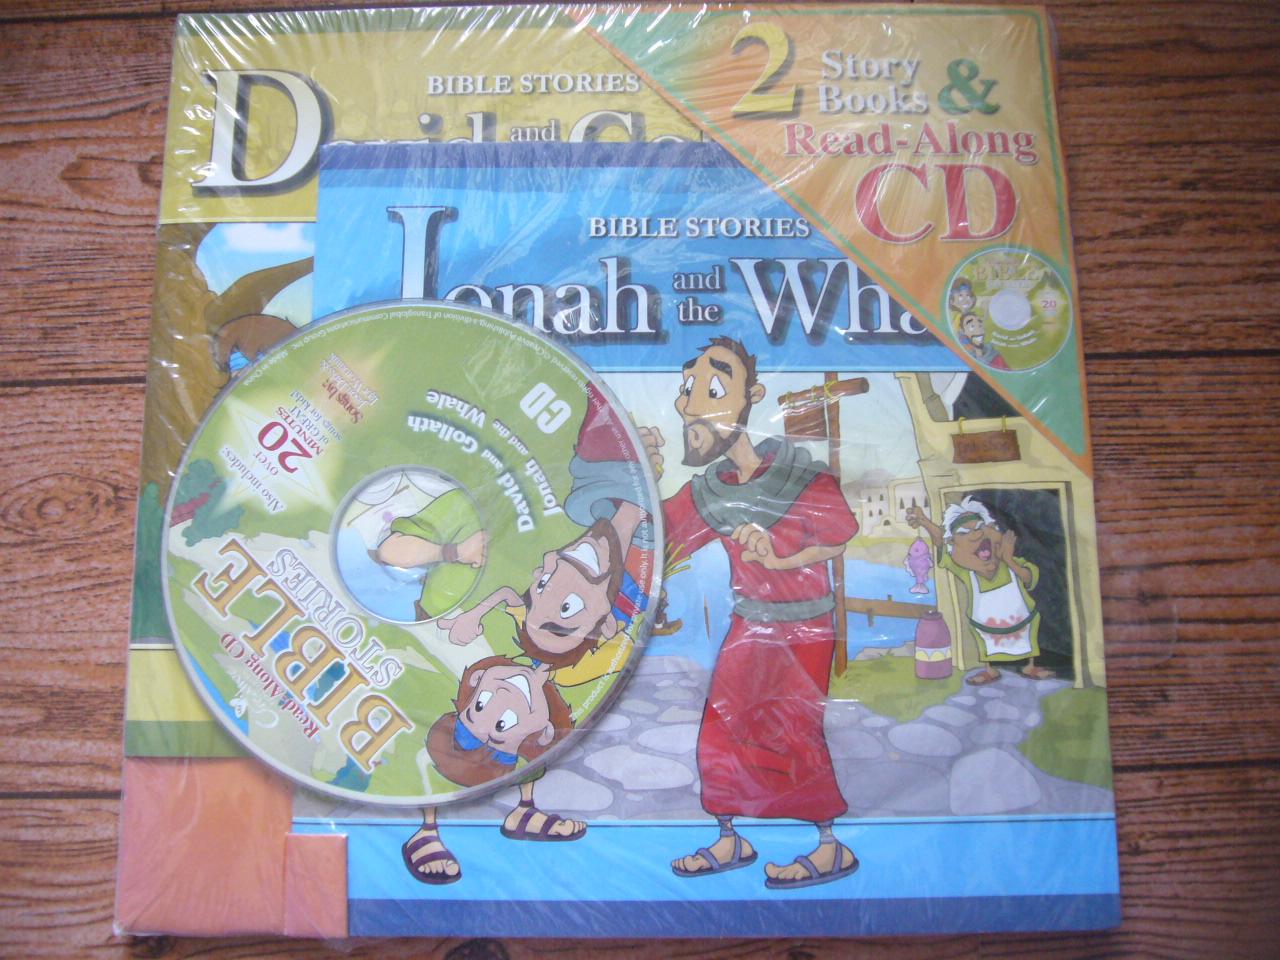 BIBLE Stories (2 Stories & Read-Along CD)